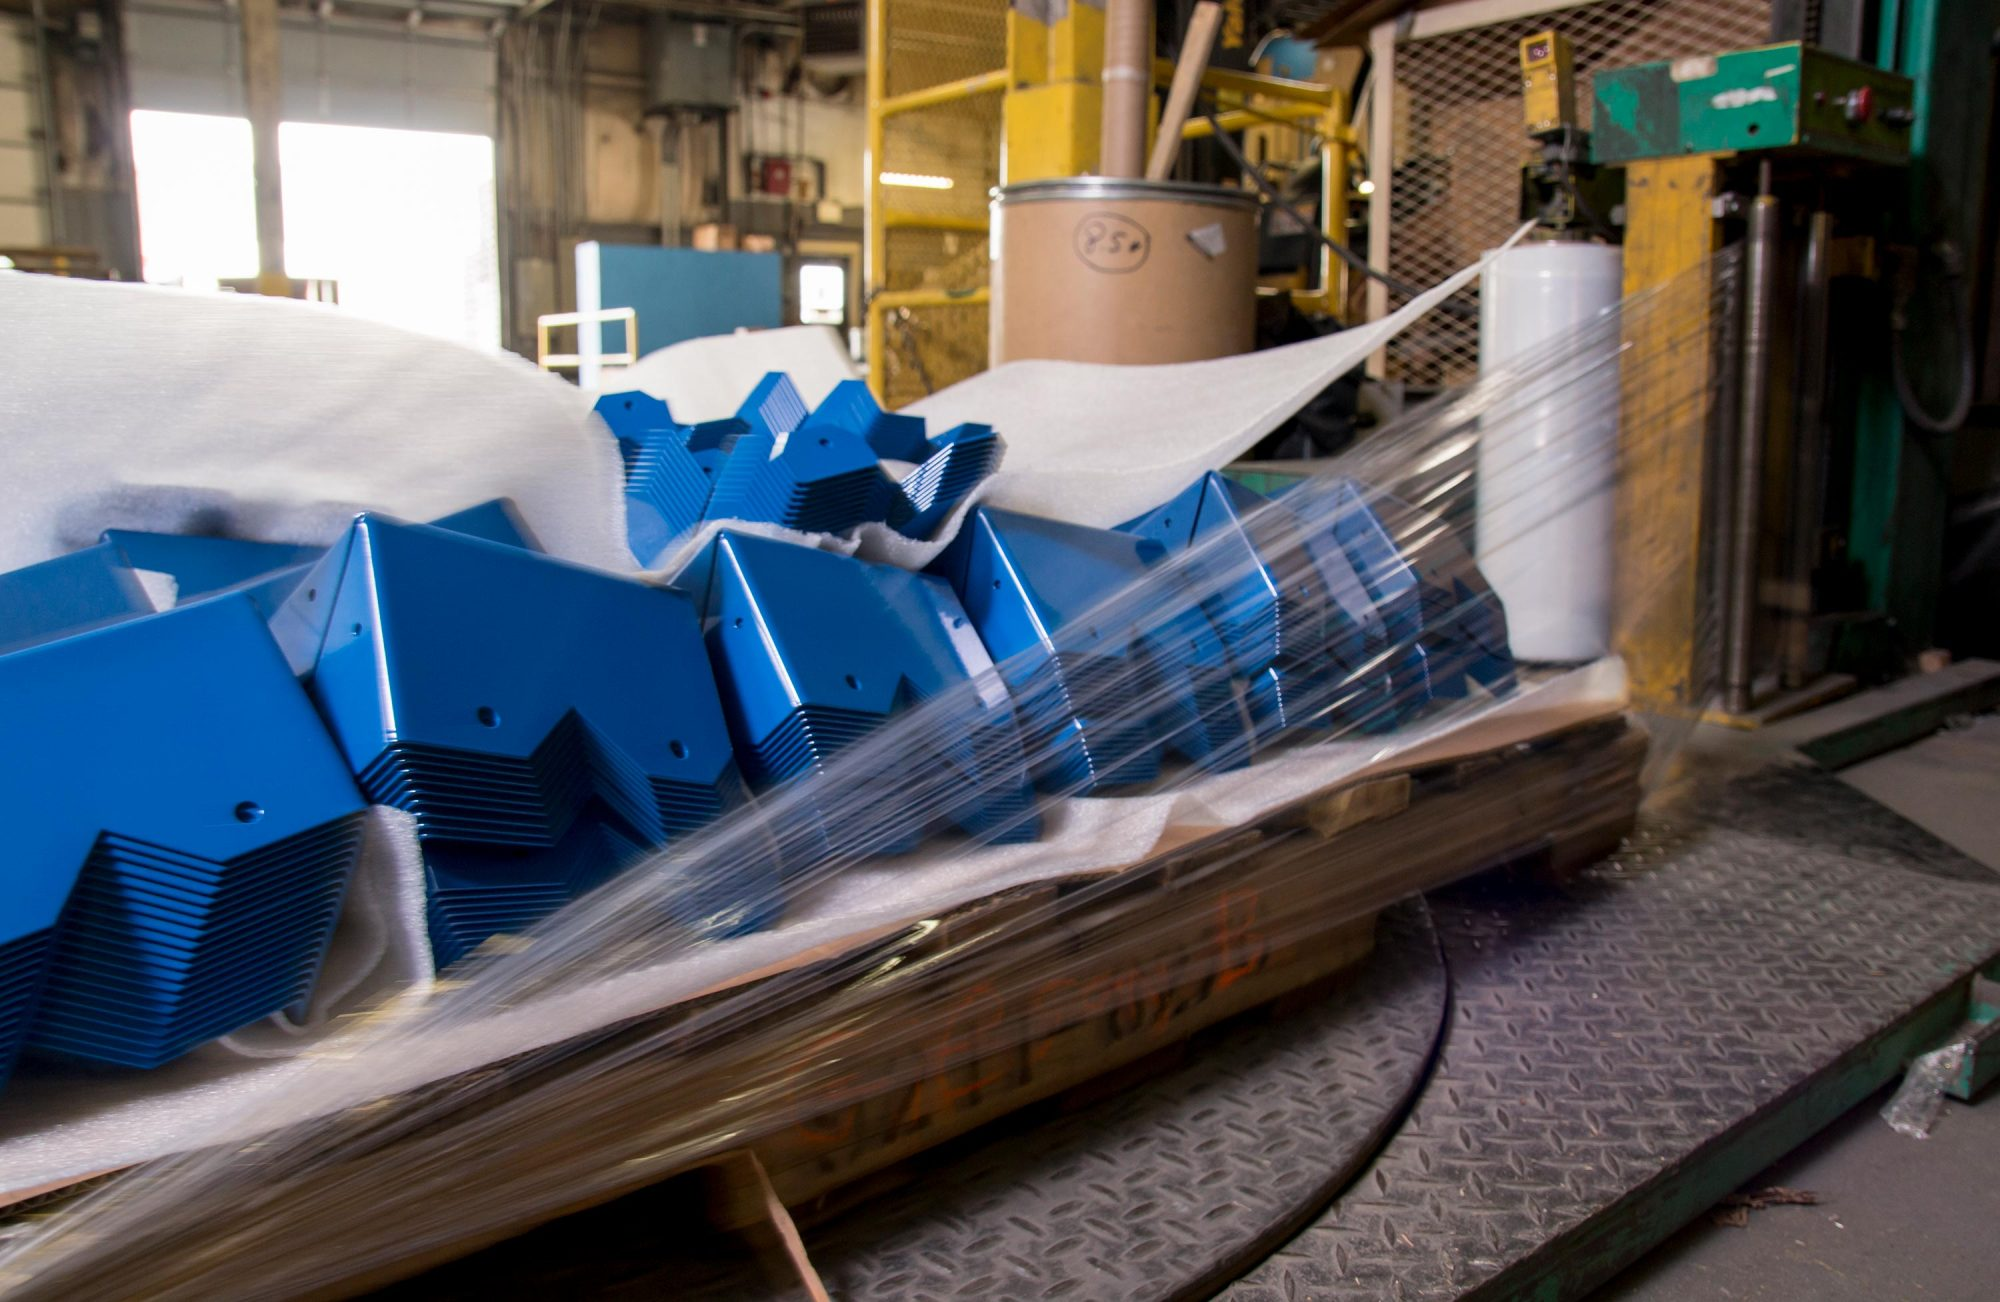 stretch wrap, stretch film, shrink wrap, stretch film, packaging film, packaging wrap, cargo control